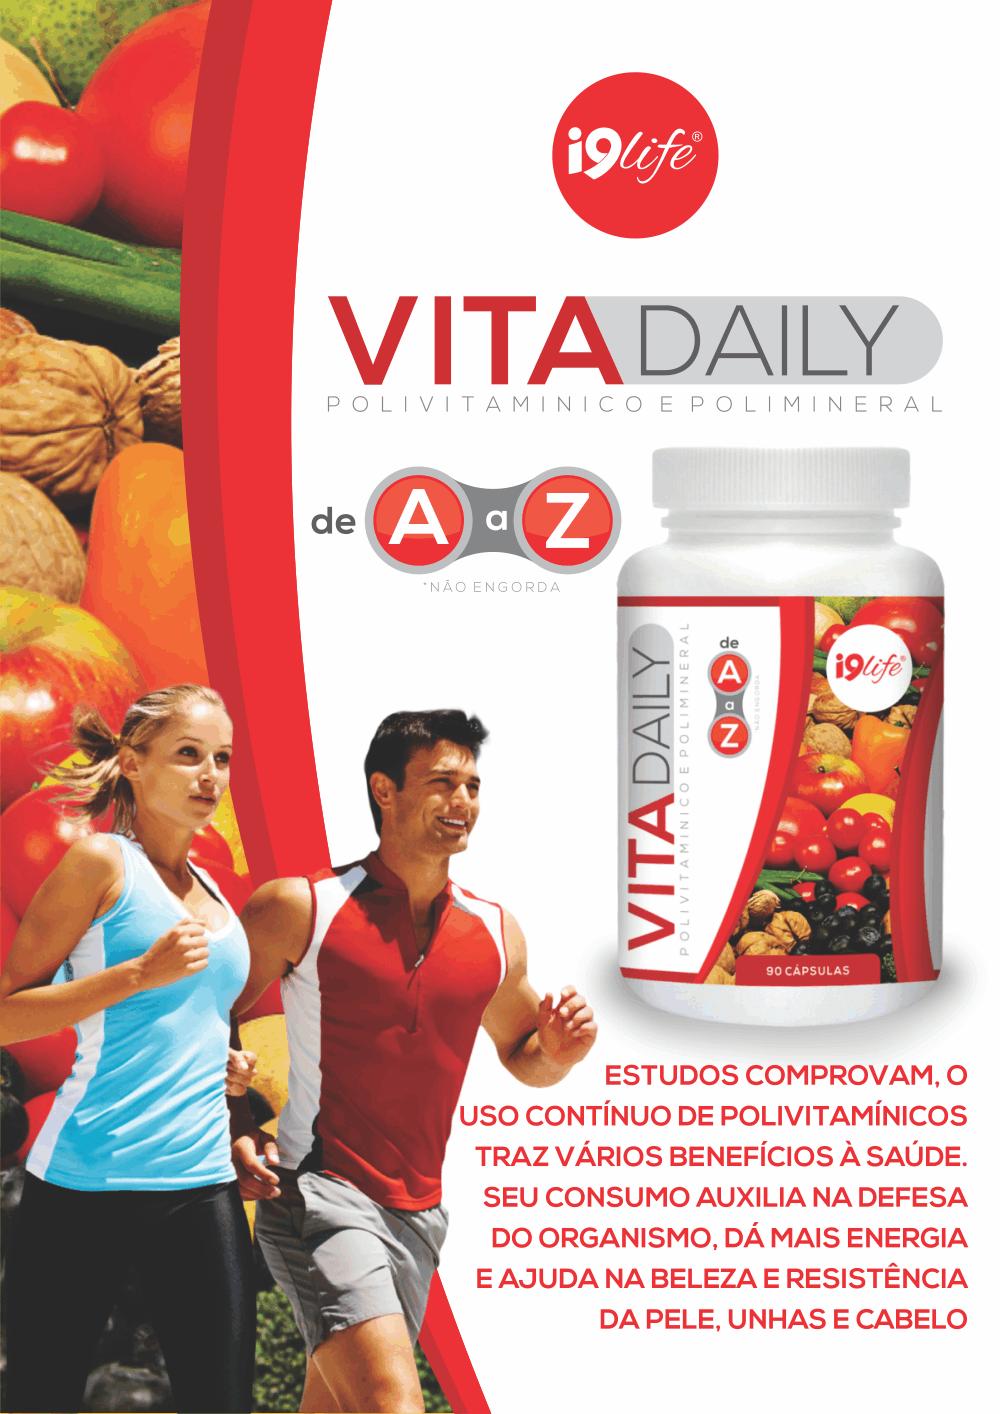 ficha nutricional vita daily i9life